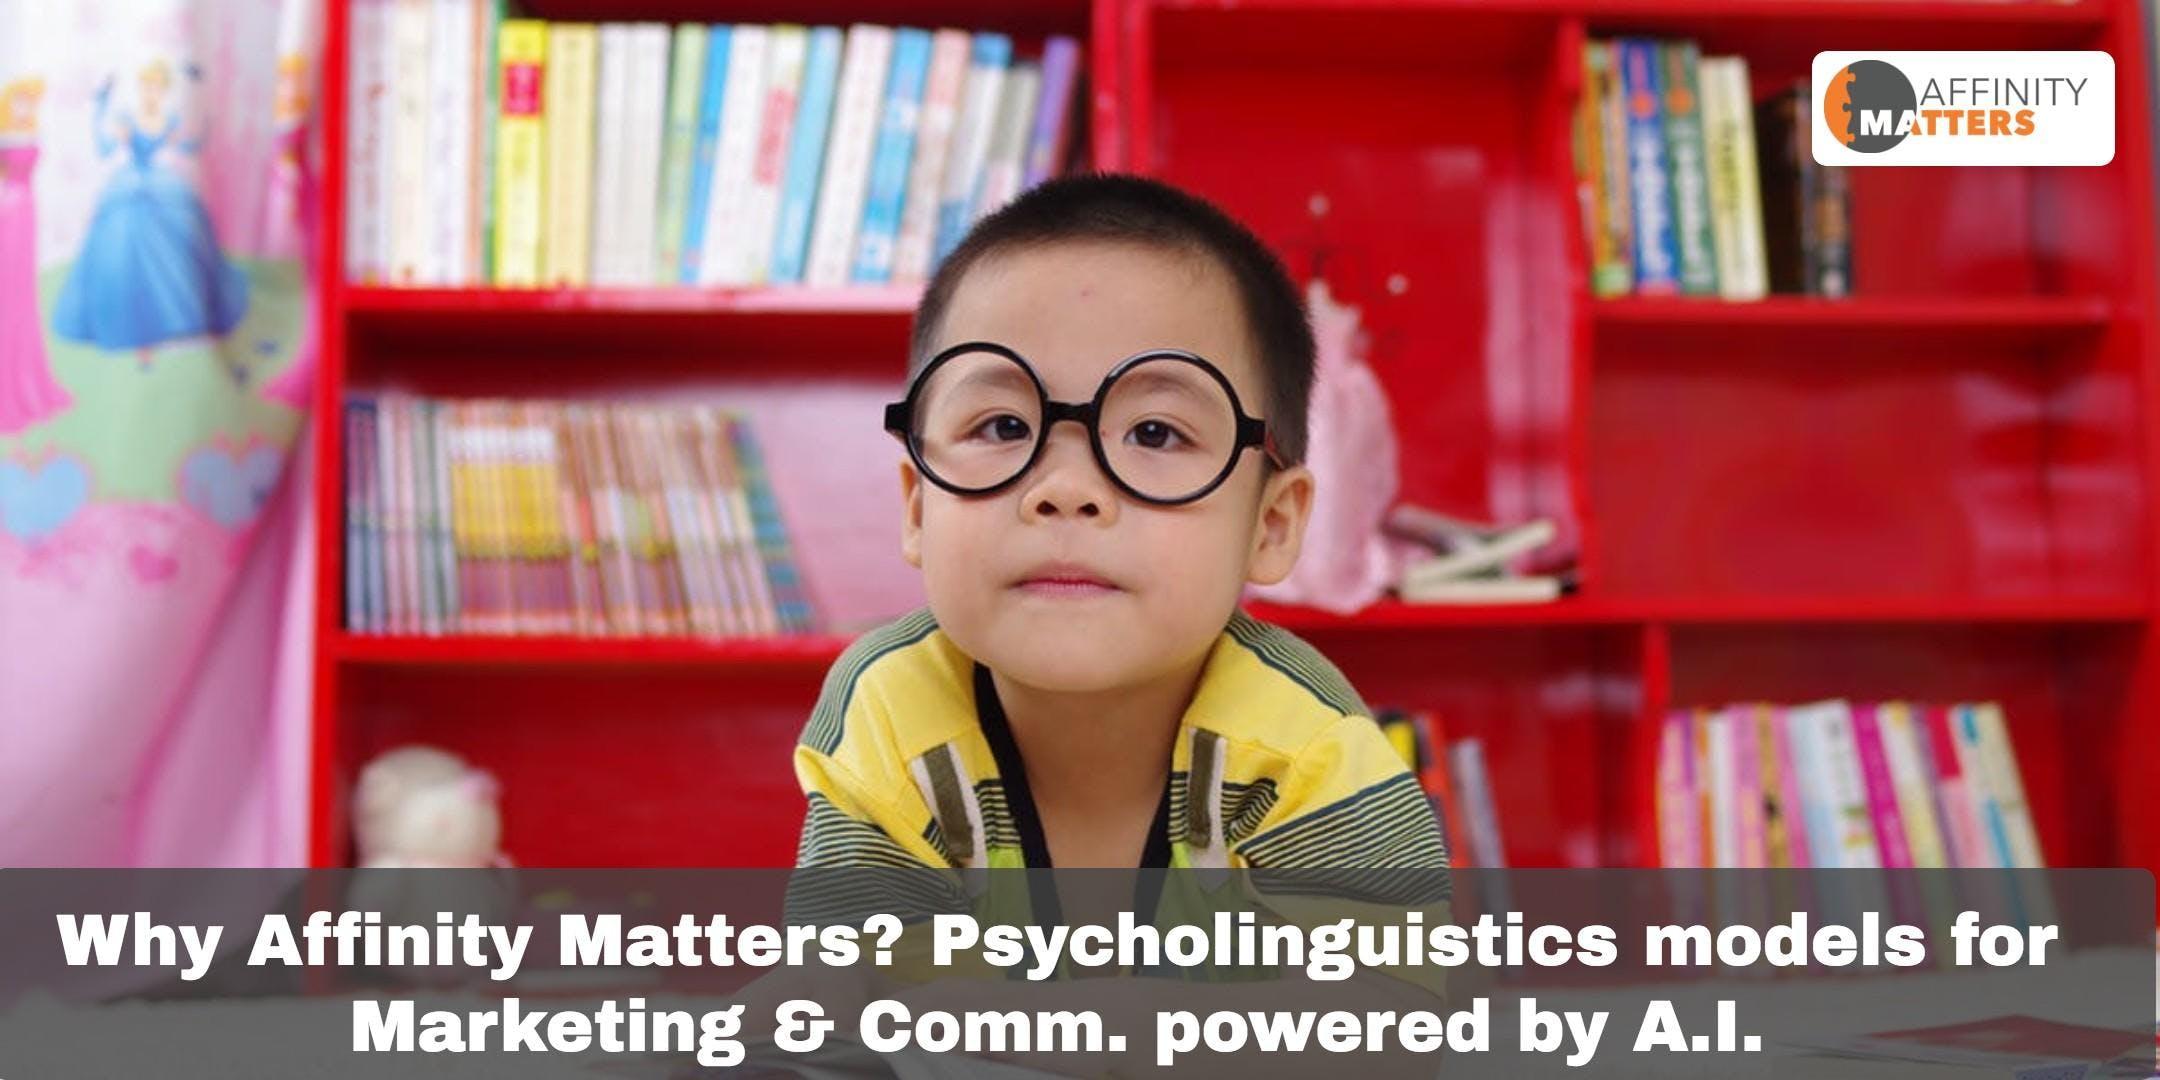 Why Affinity Matters? Psycholinguistics model